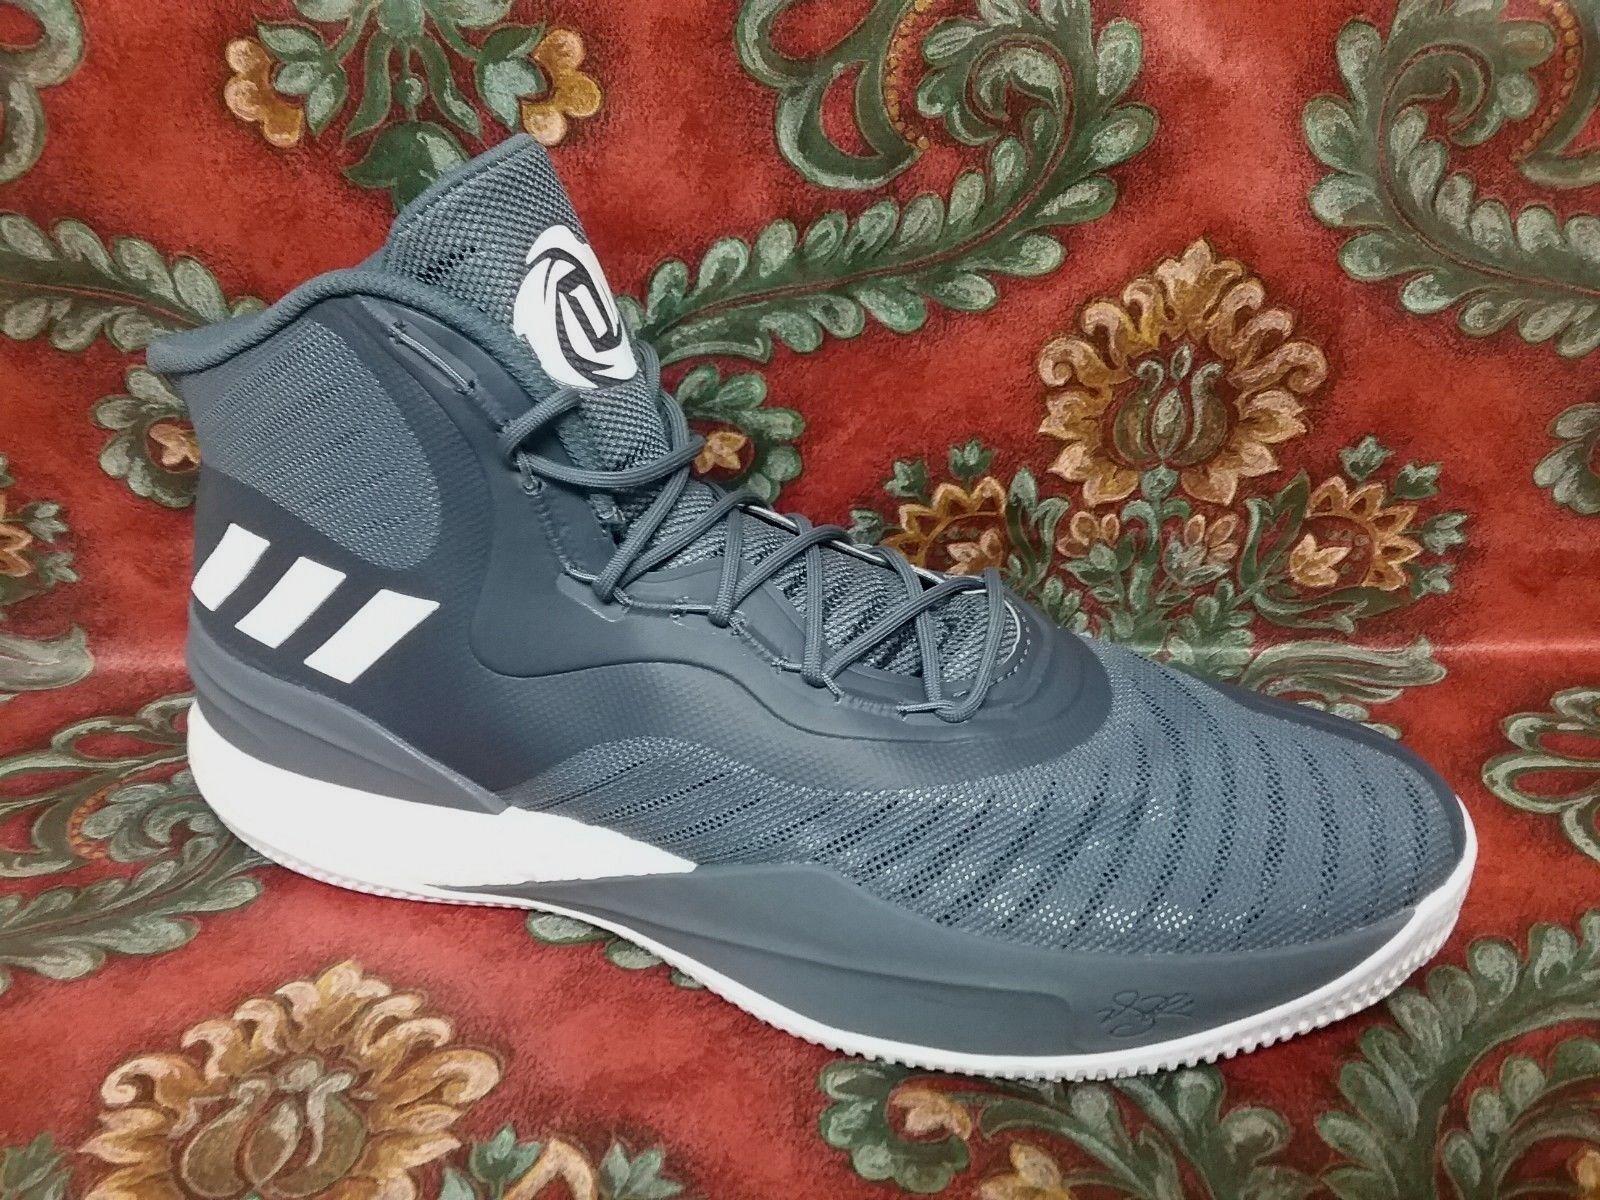 ADIDAS - CQ1620 - D. DOSE - DERRICK ROSE - Homme Chaussures - Gris Blanc -